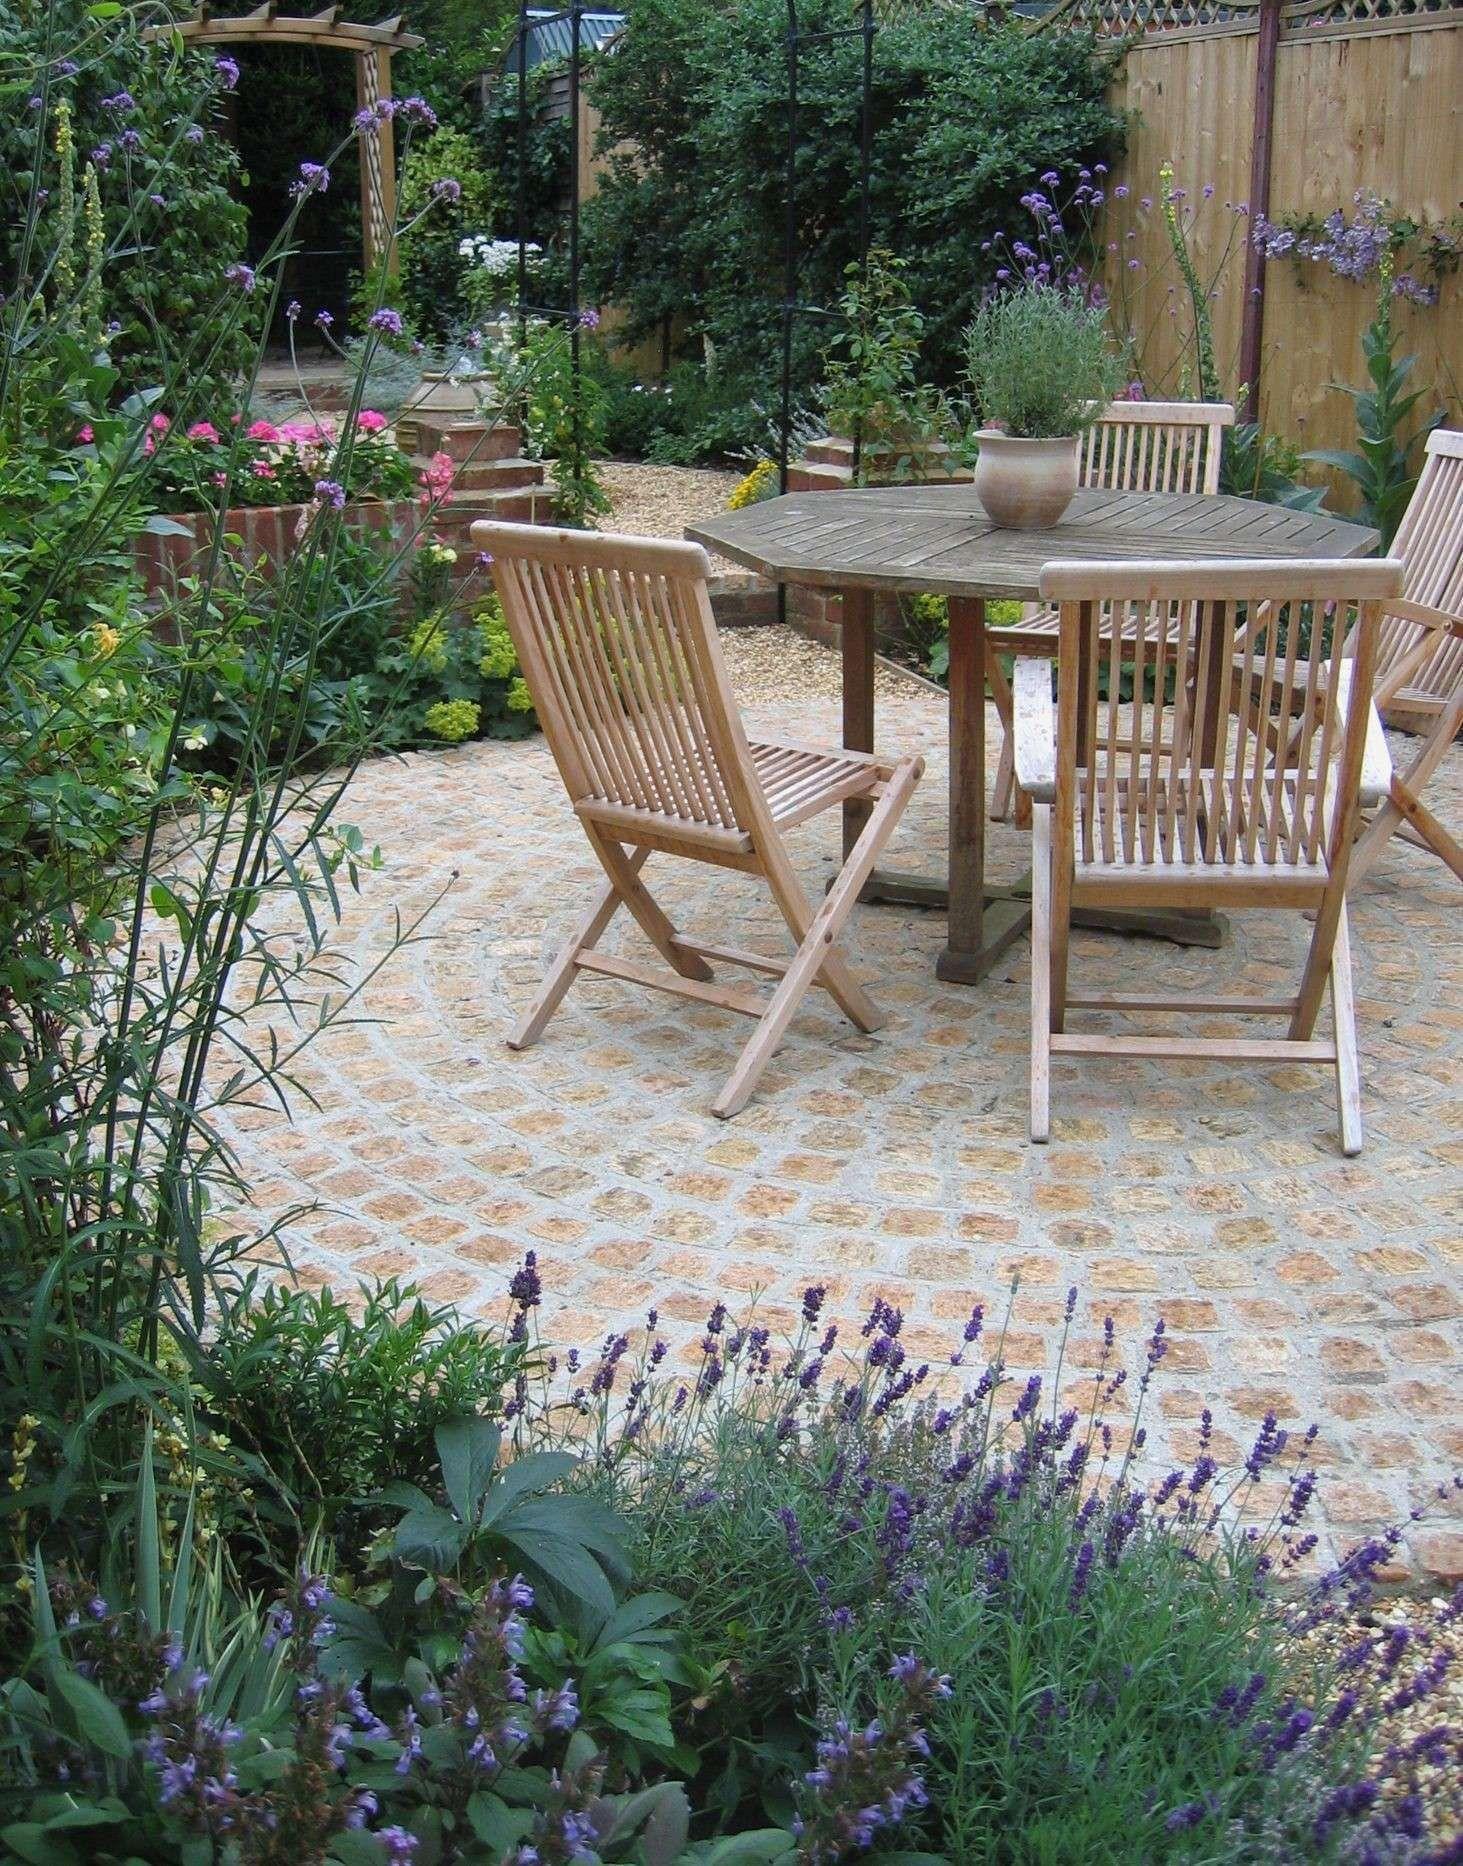 Diy Garden Trellis Ideas In 2020 Small Cottage Garden Ideas